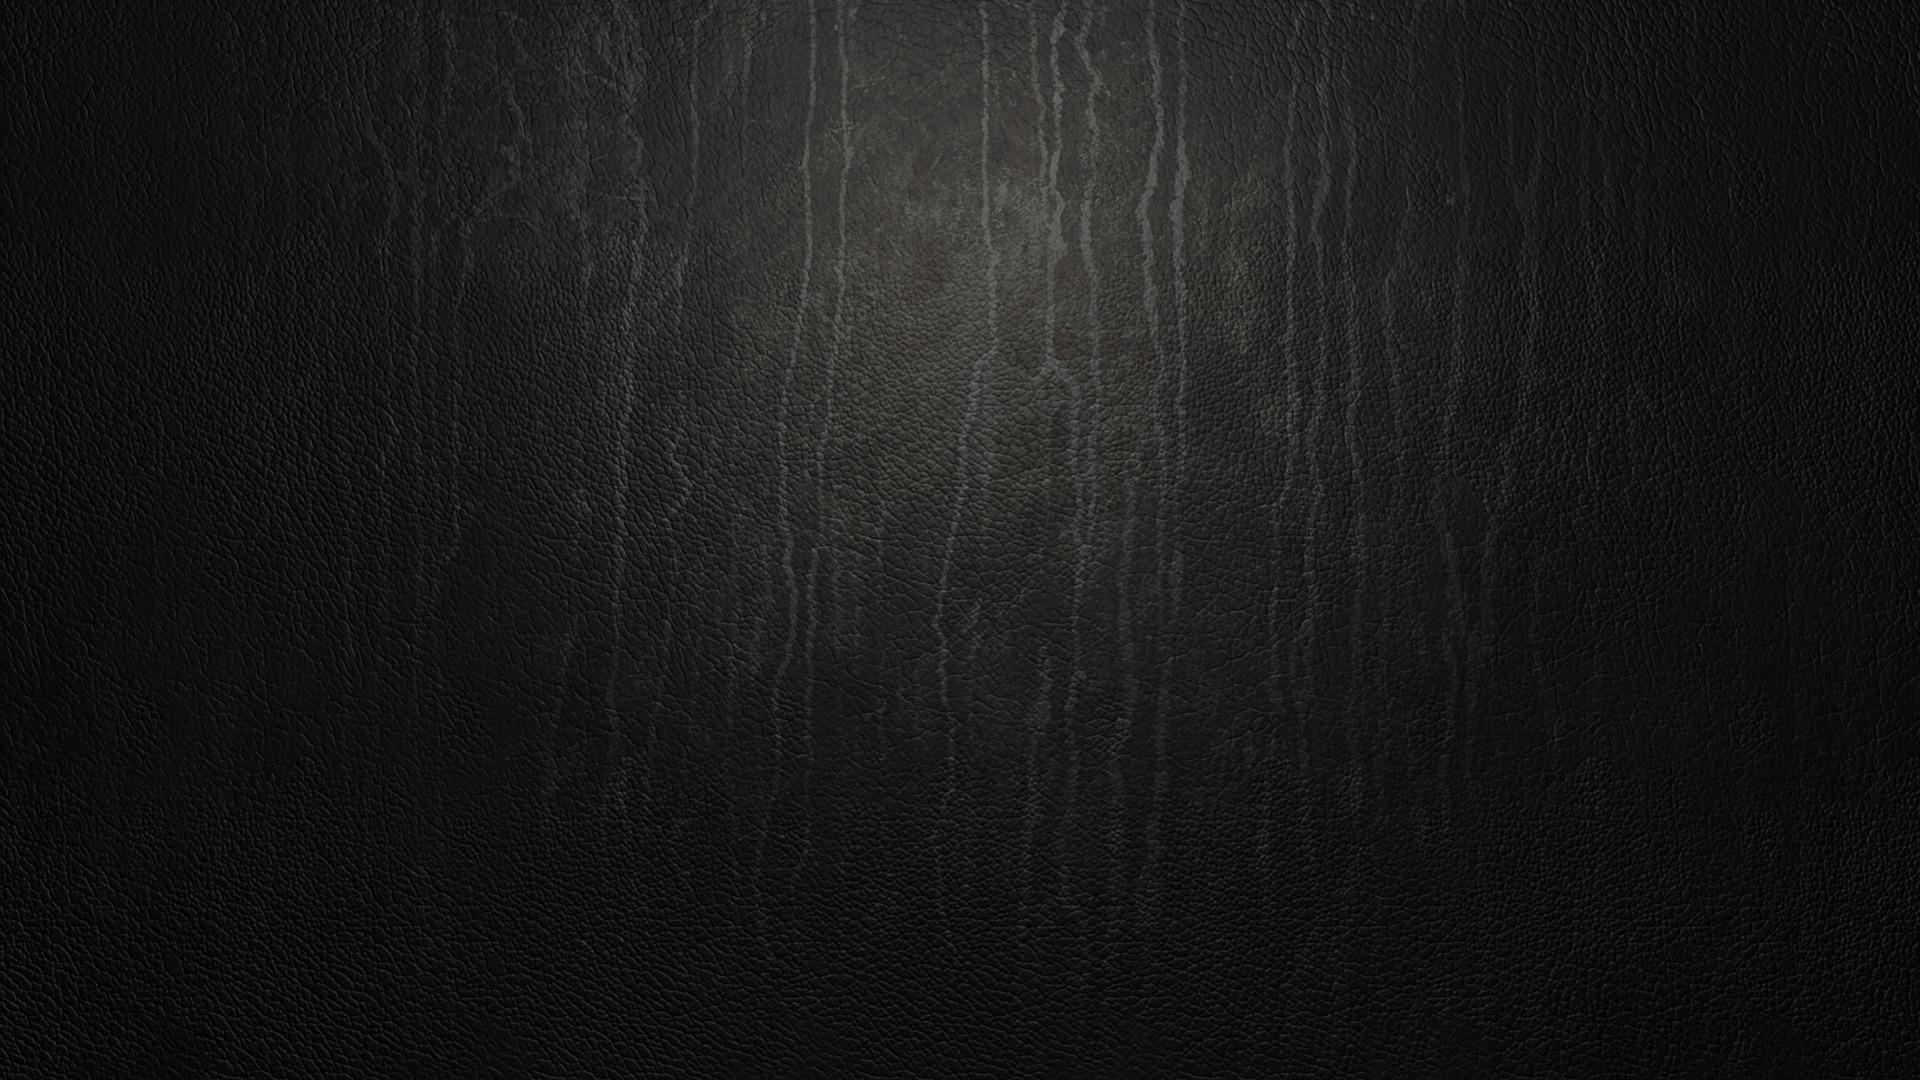 Black Hd Wallpaper 1920X1080 9 Desktop Wallpaper